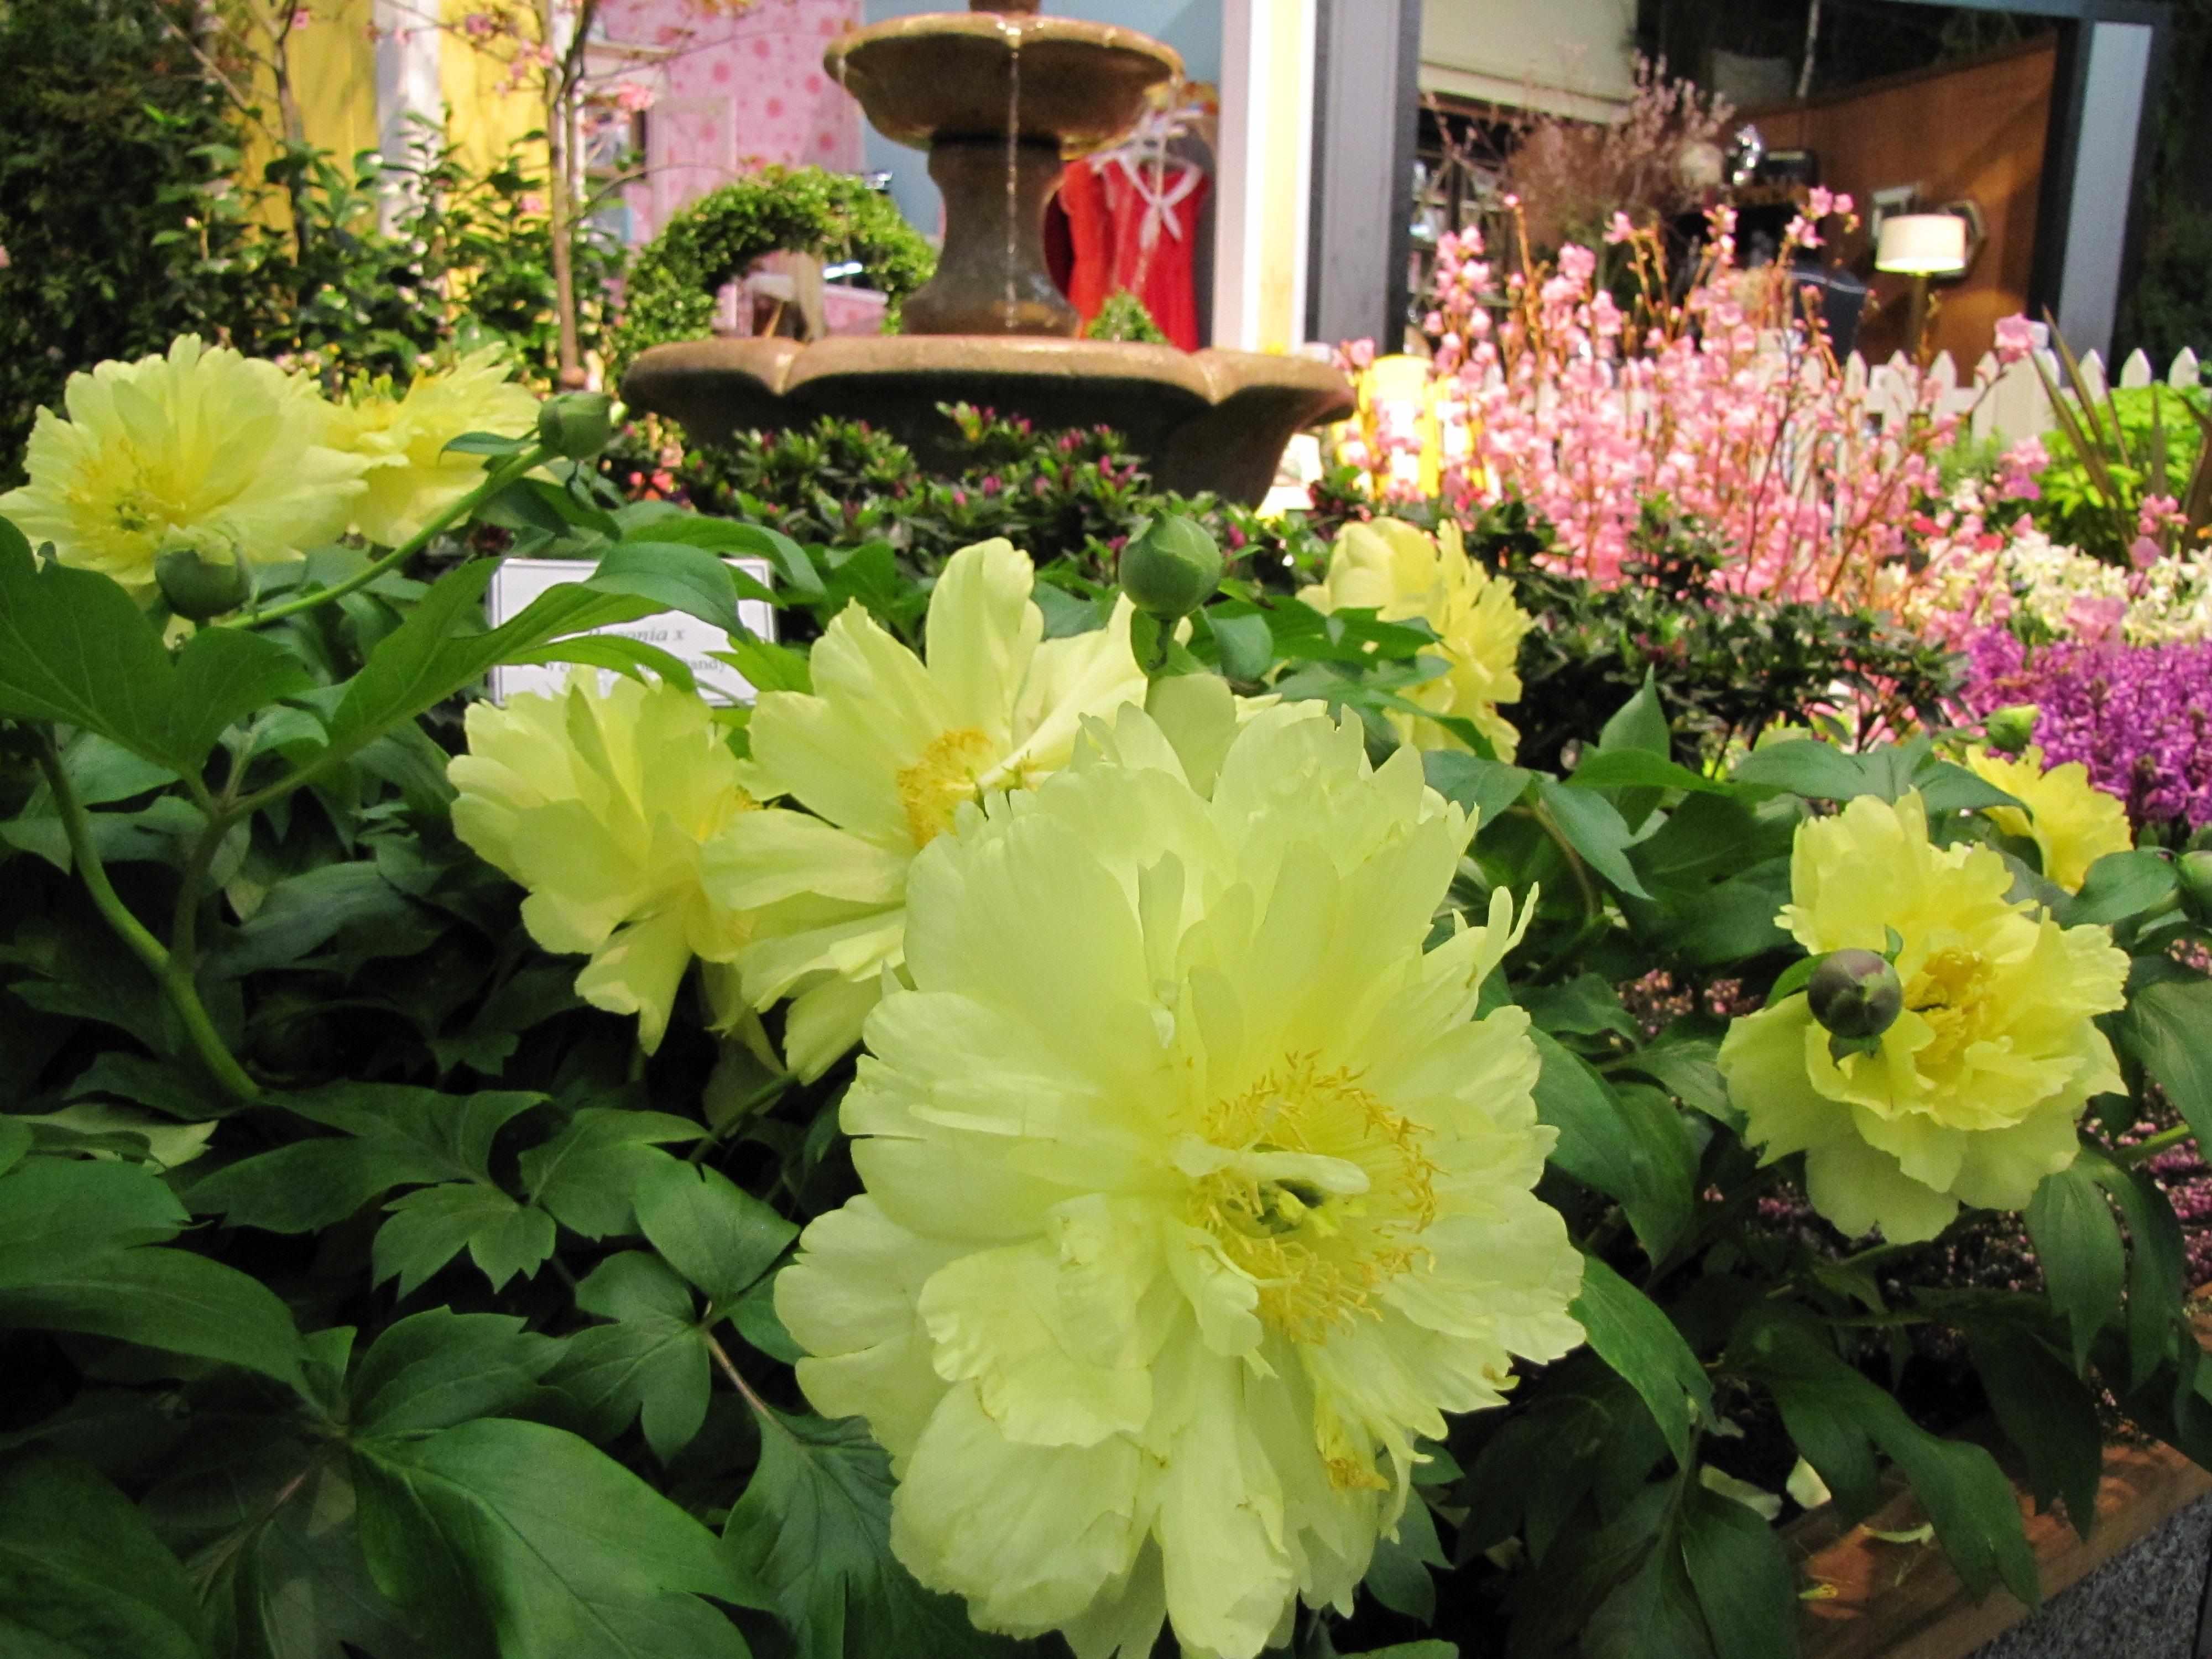 Northwest flower and garden show peony rainyleaf - Northwest flower and garden show ...